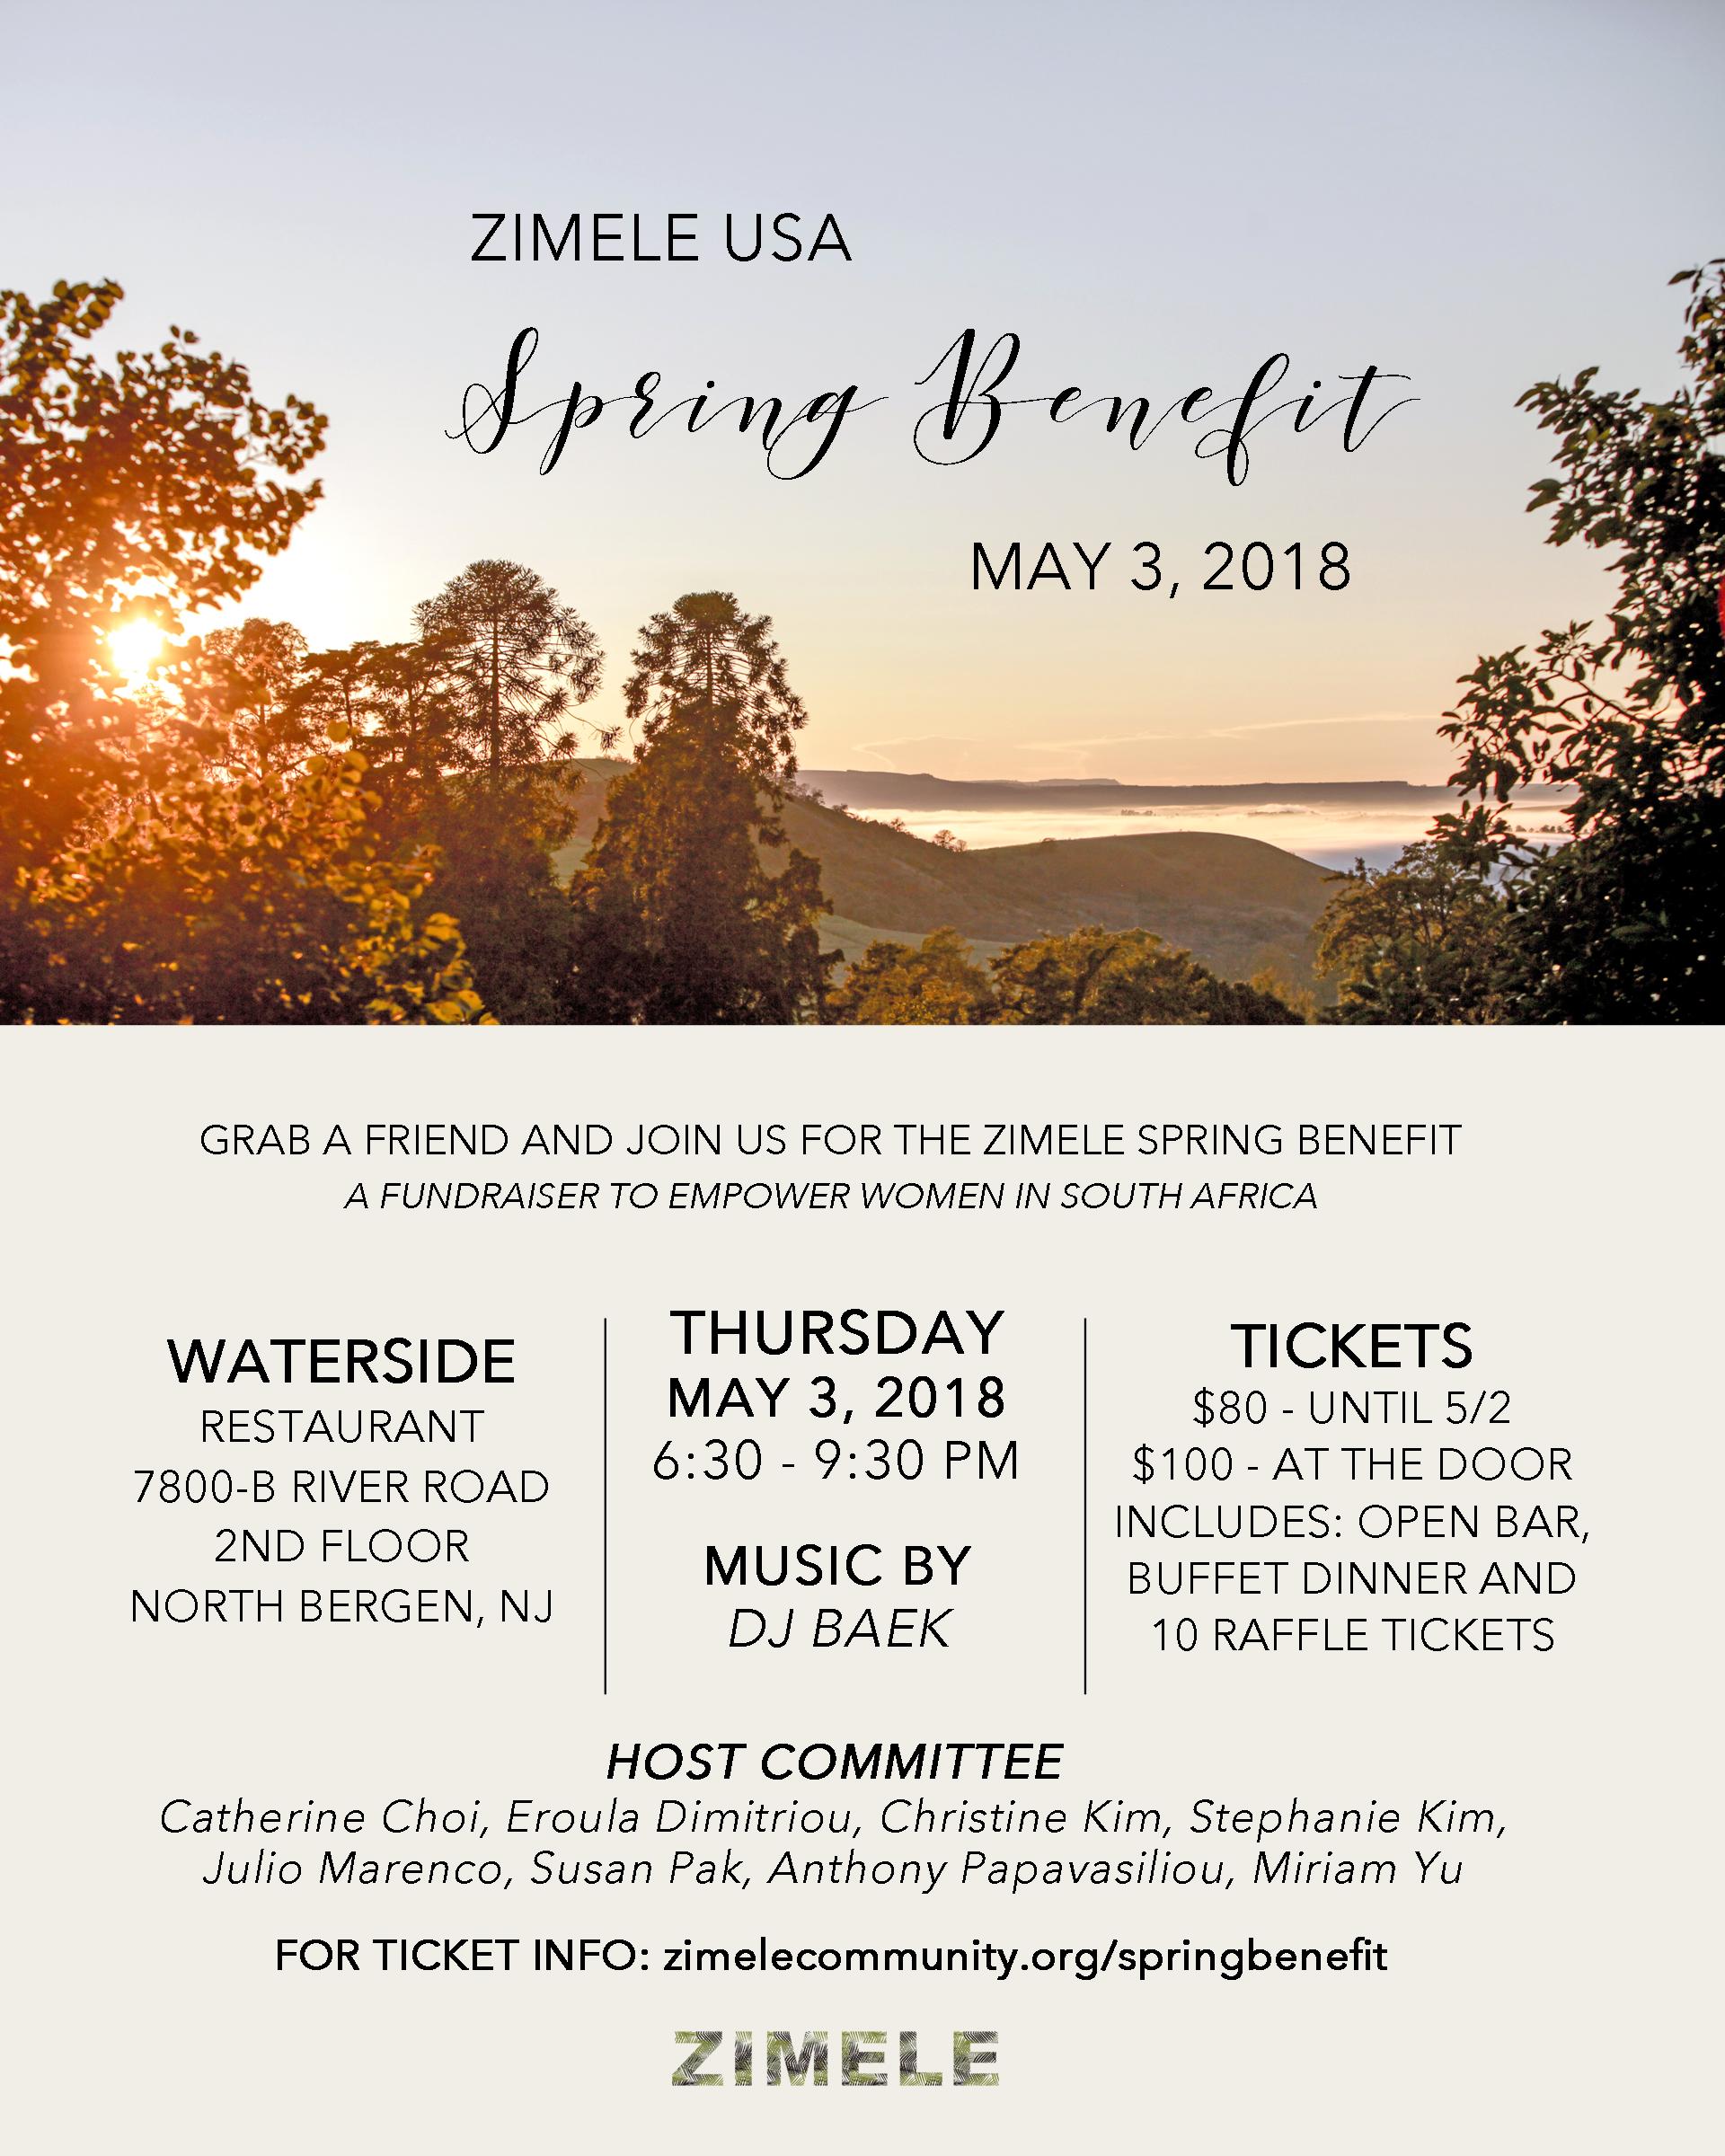 2018 Spring Benefit Flyer2.jpg